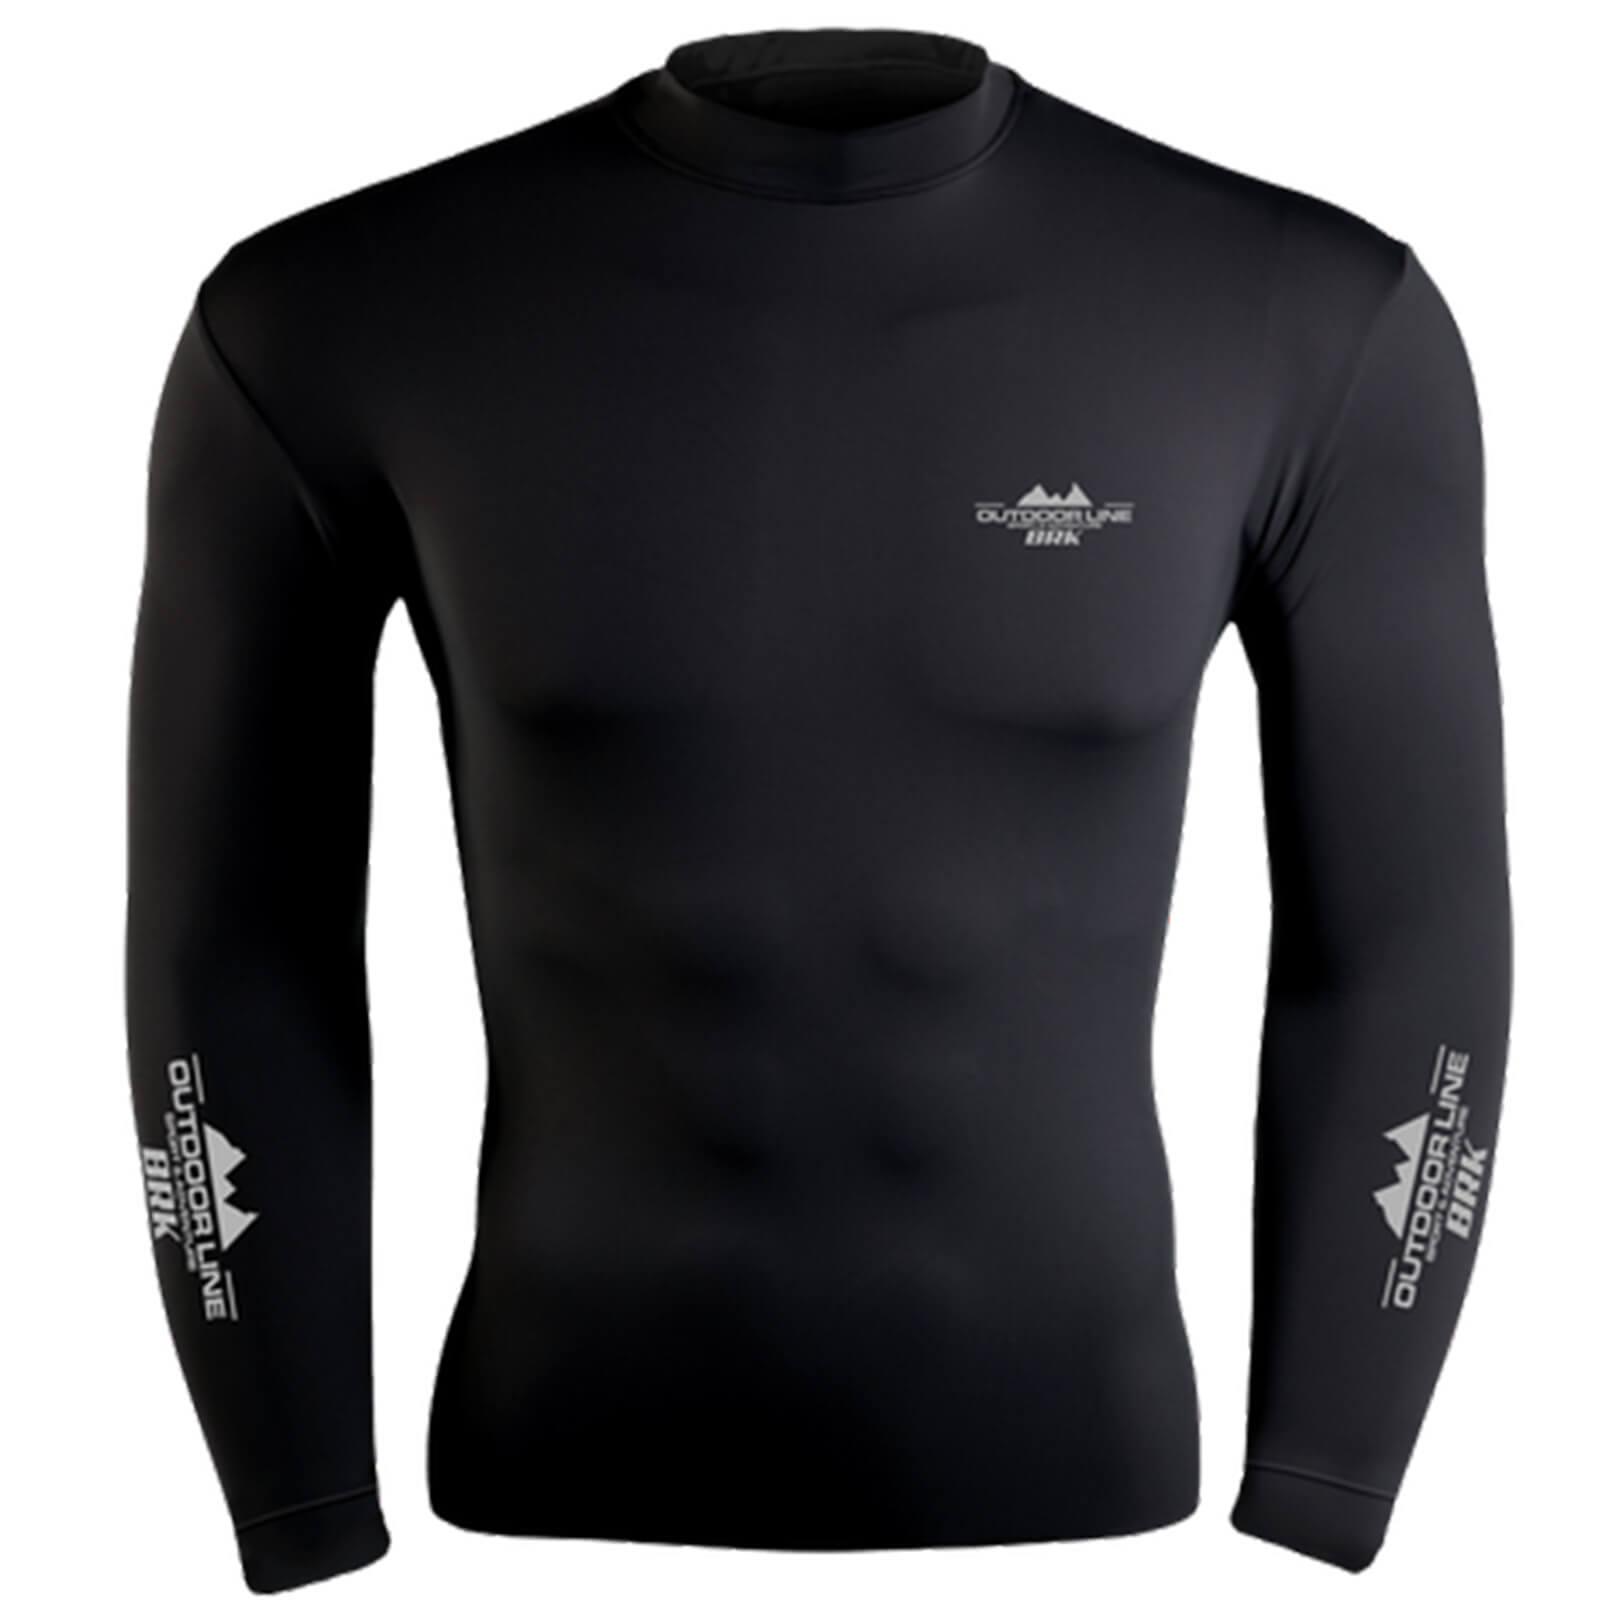 Camiseta BRK Poliamida FPU 50+ Preta Outdoor